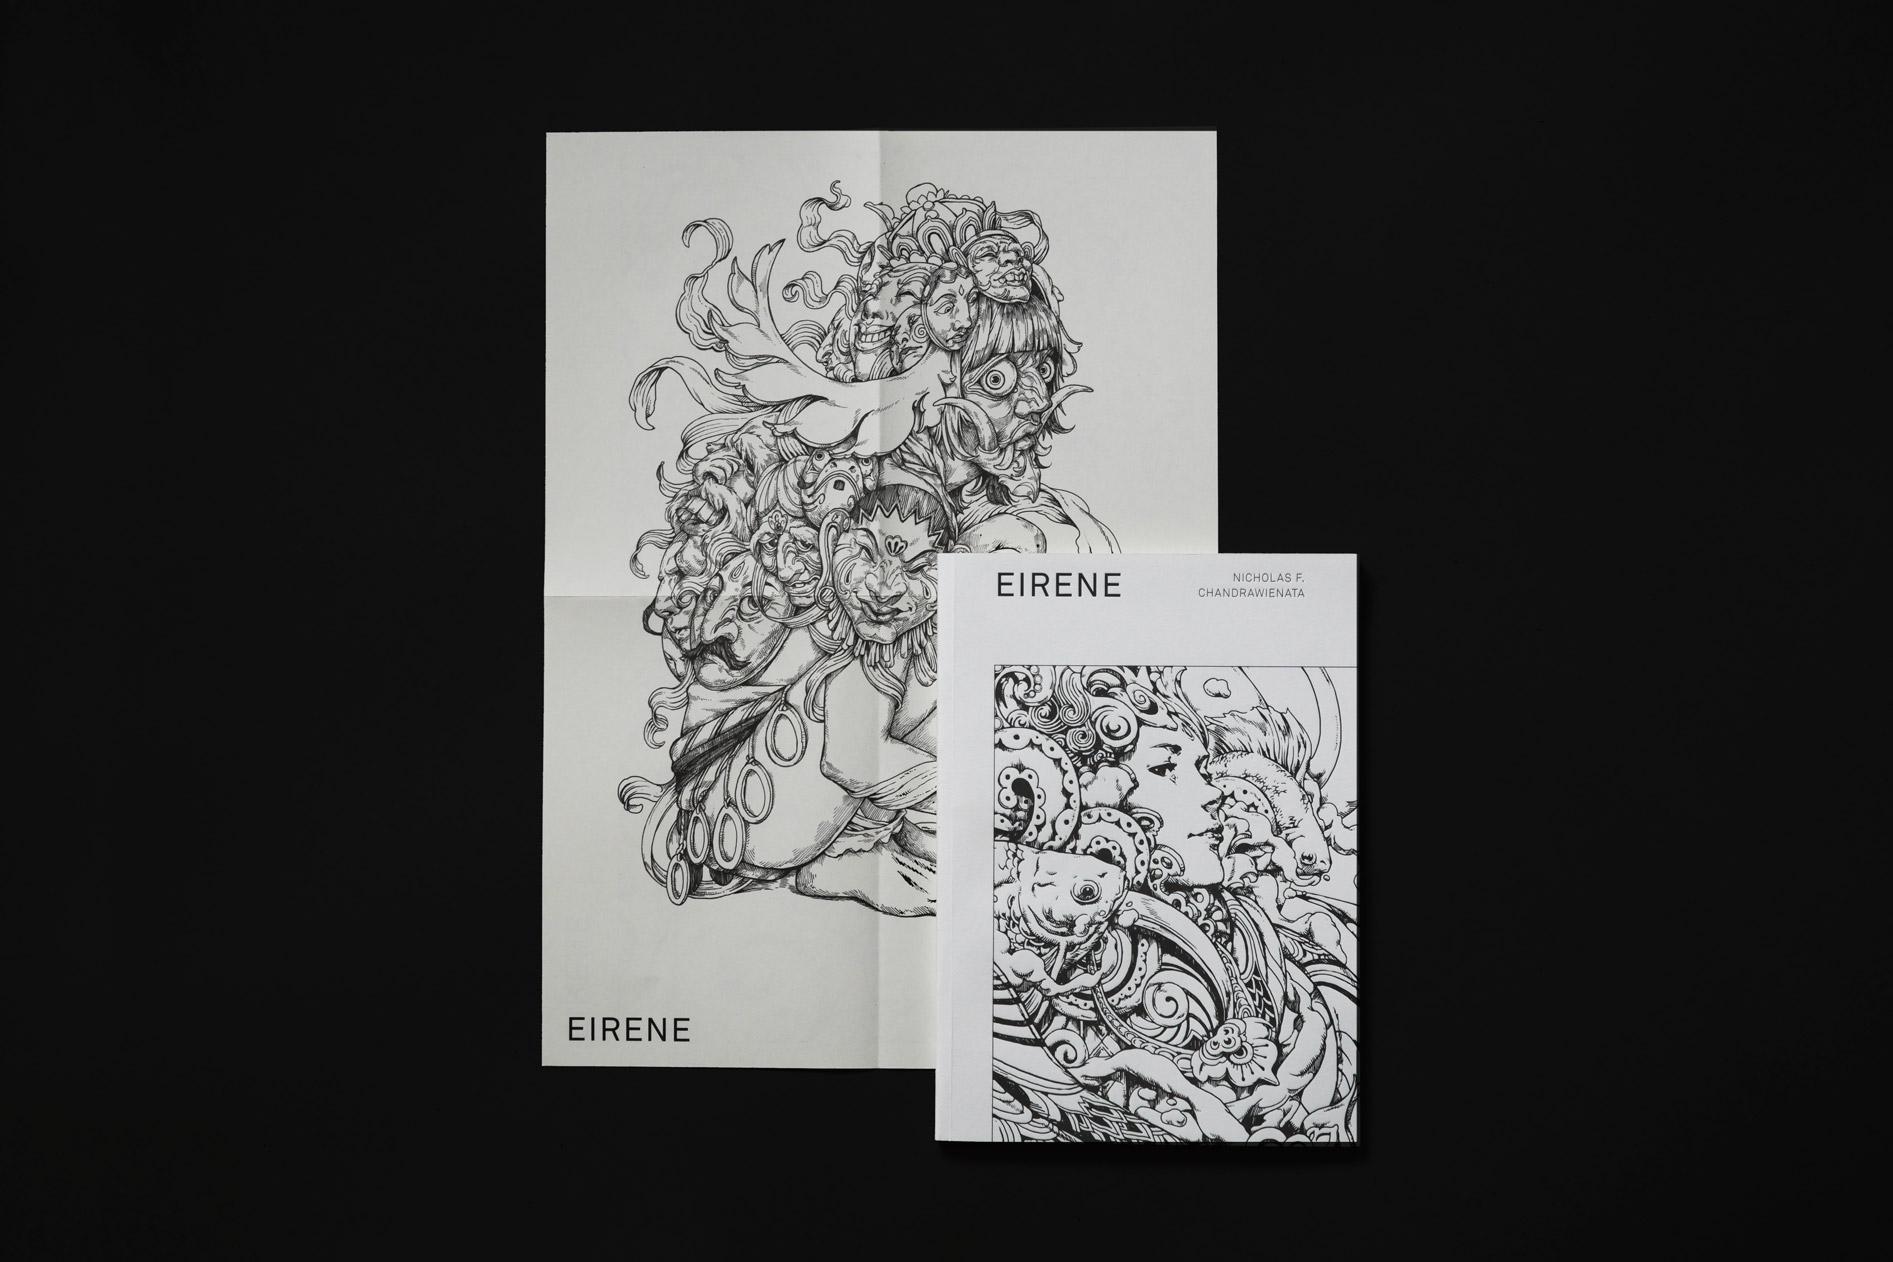 eirene-01